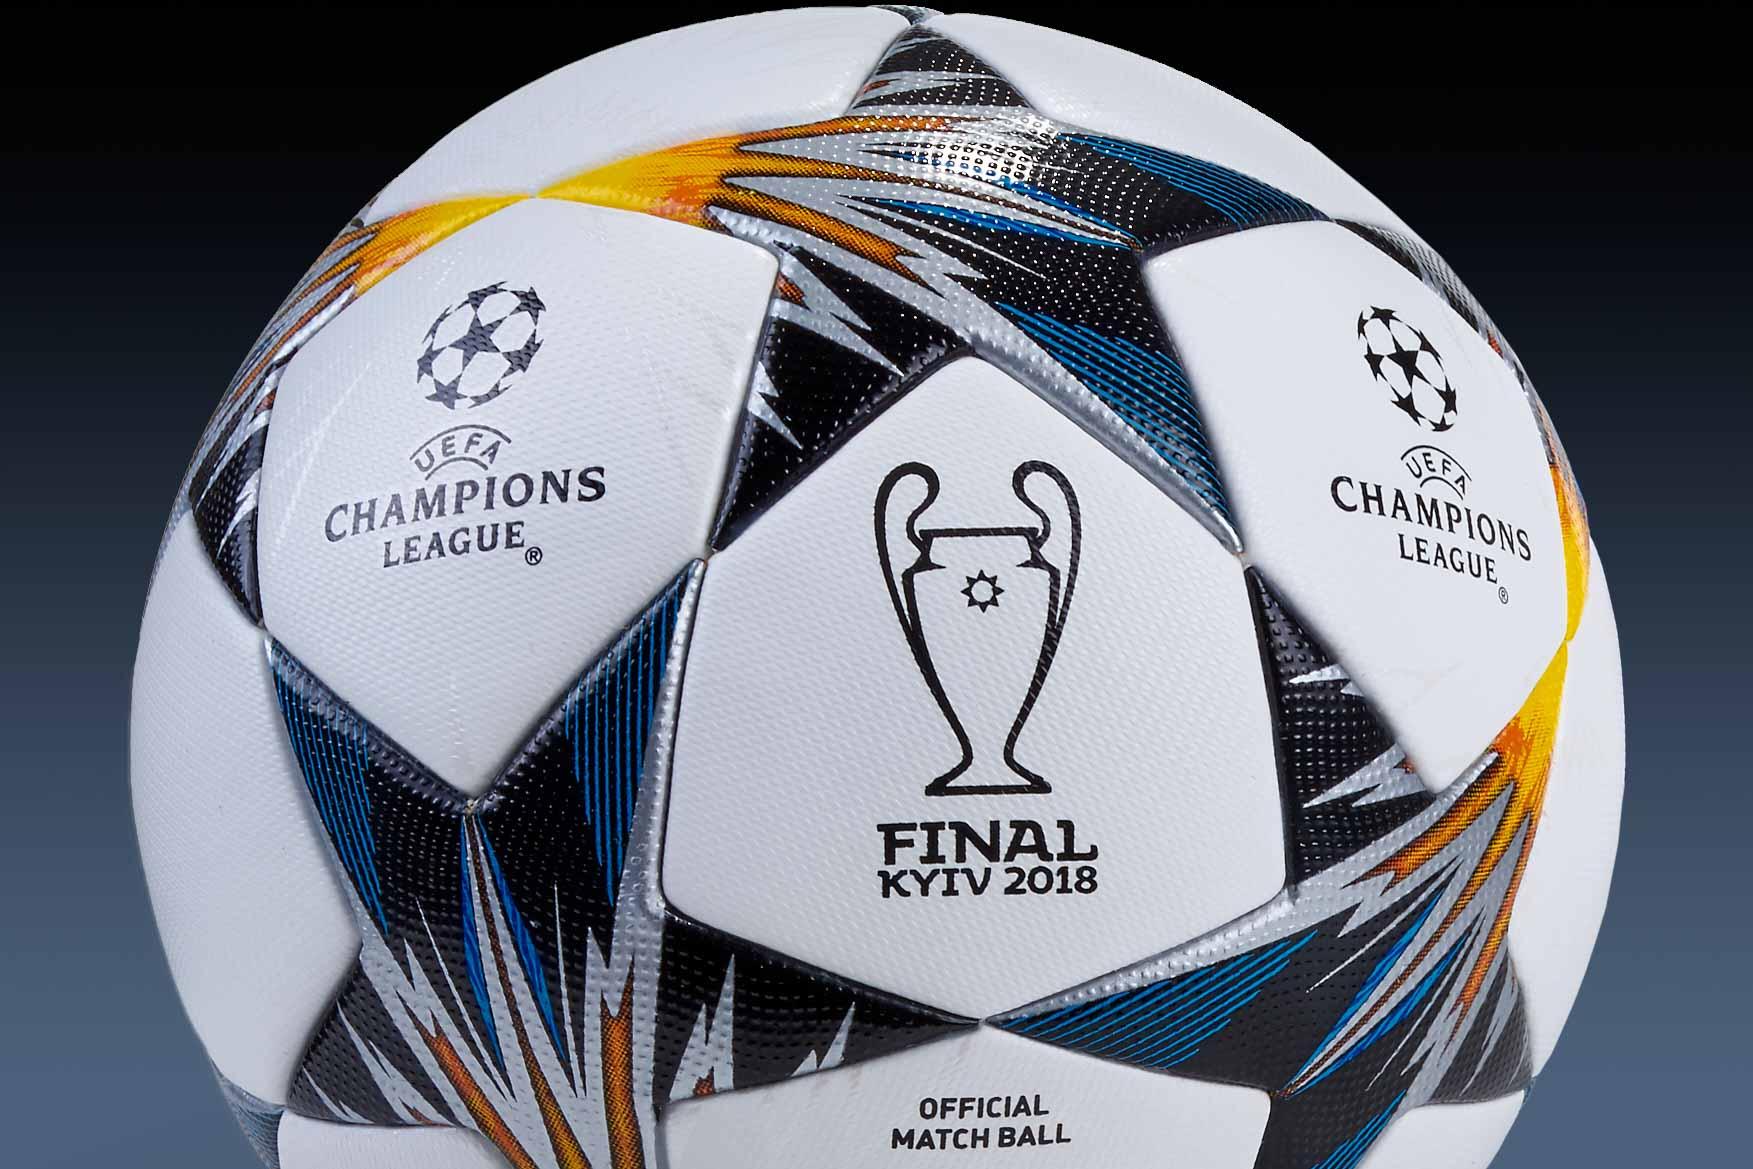 Find Your Soccer Ball - Soccer Balls For All Levels - SoccerPro.com